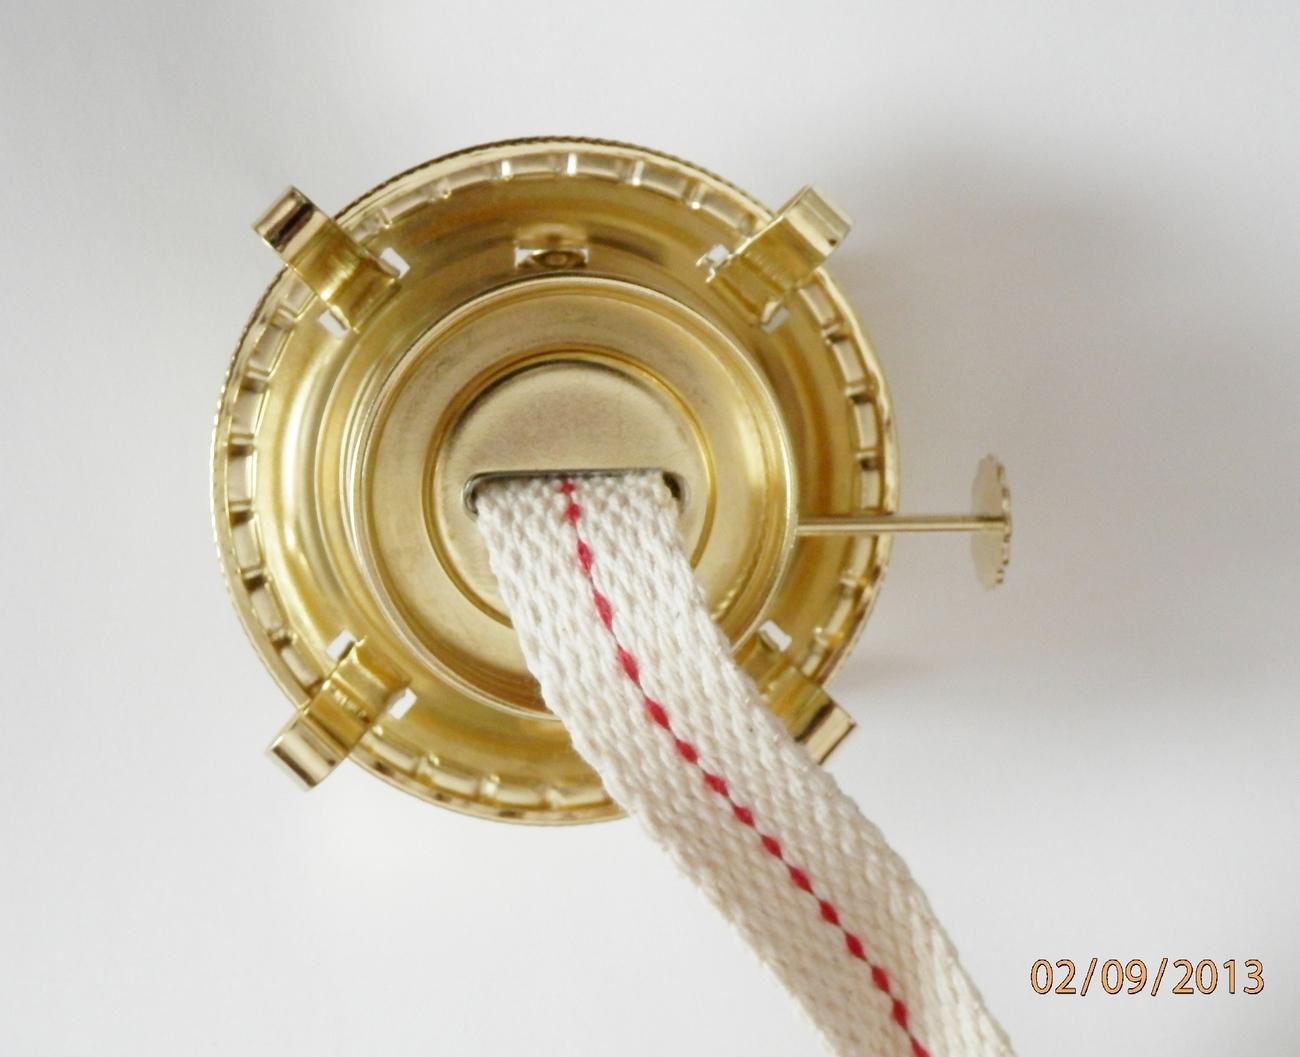 "Oil Lamp Burner-Brass Plated Threaded Collar-w/wick Fits 1-3/4"" collar"